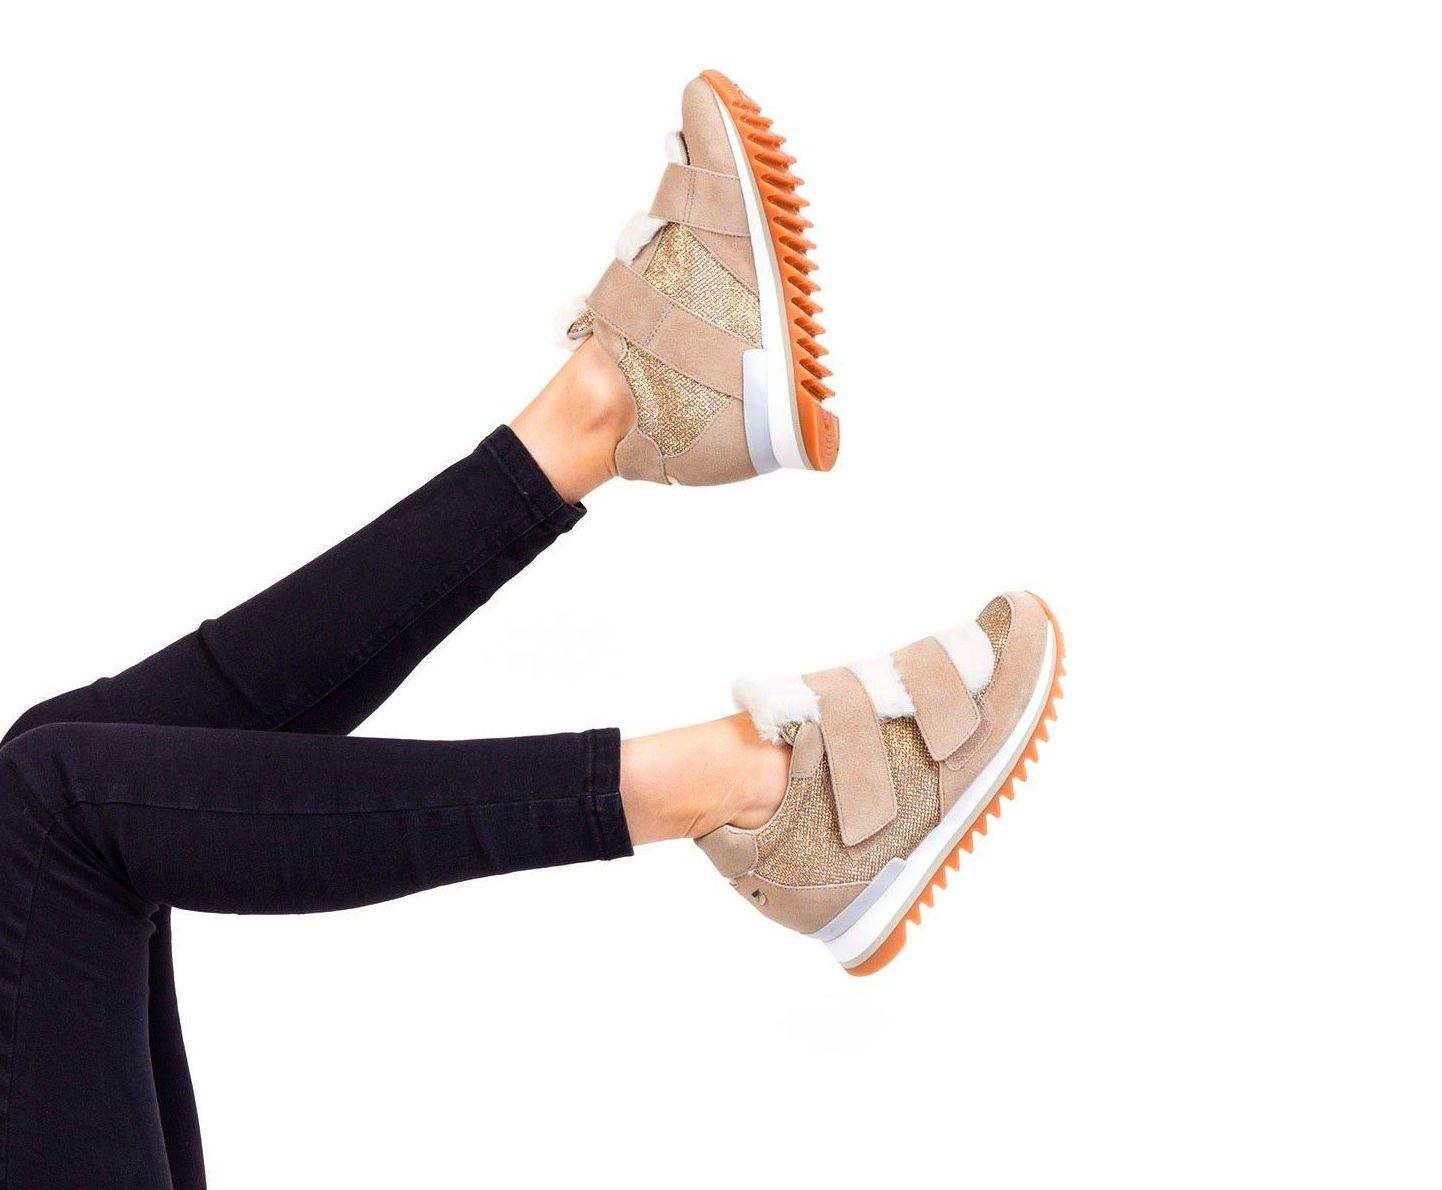 Sneakers blancas lengueta